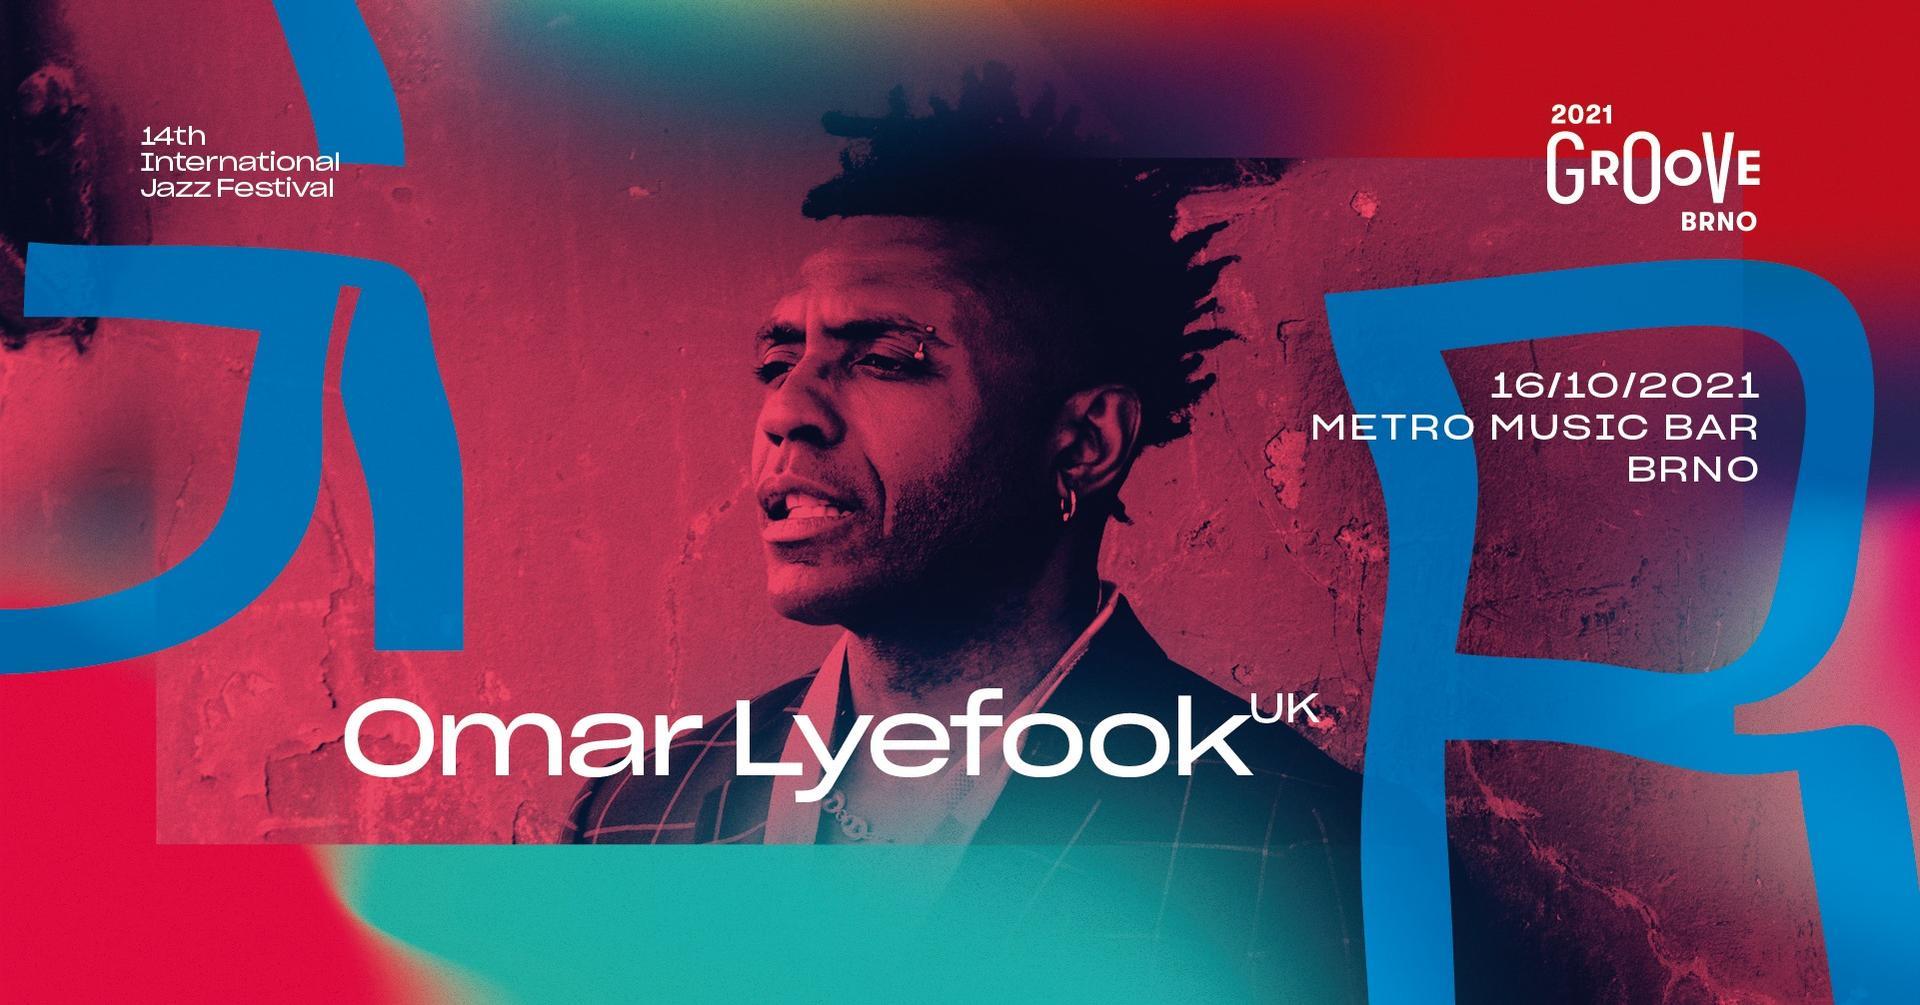 Omar Lyefook / Groove Brno 2021